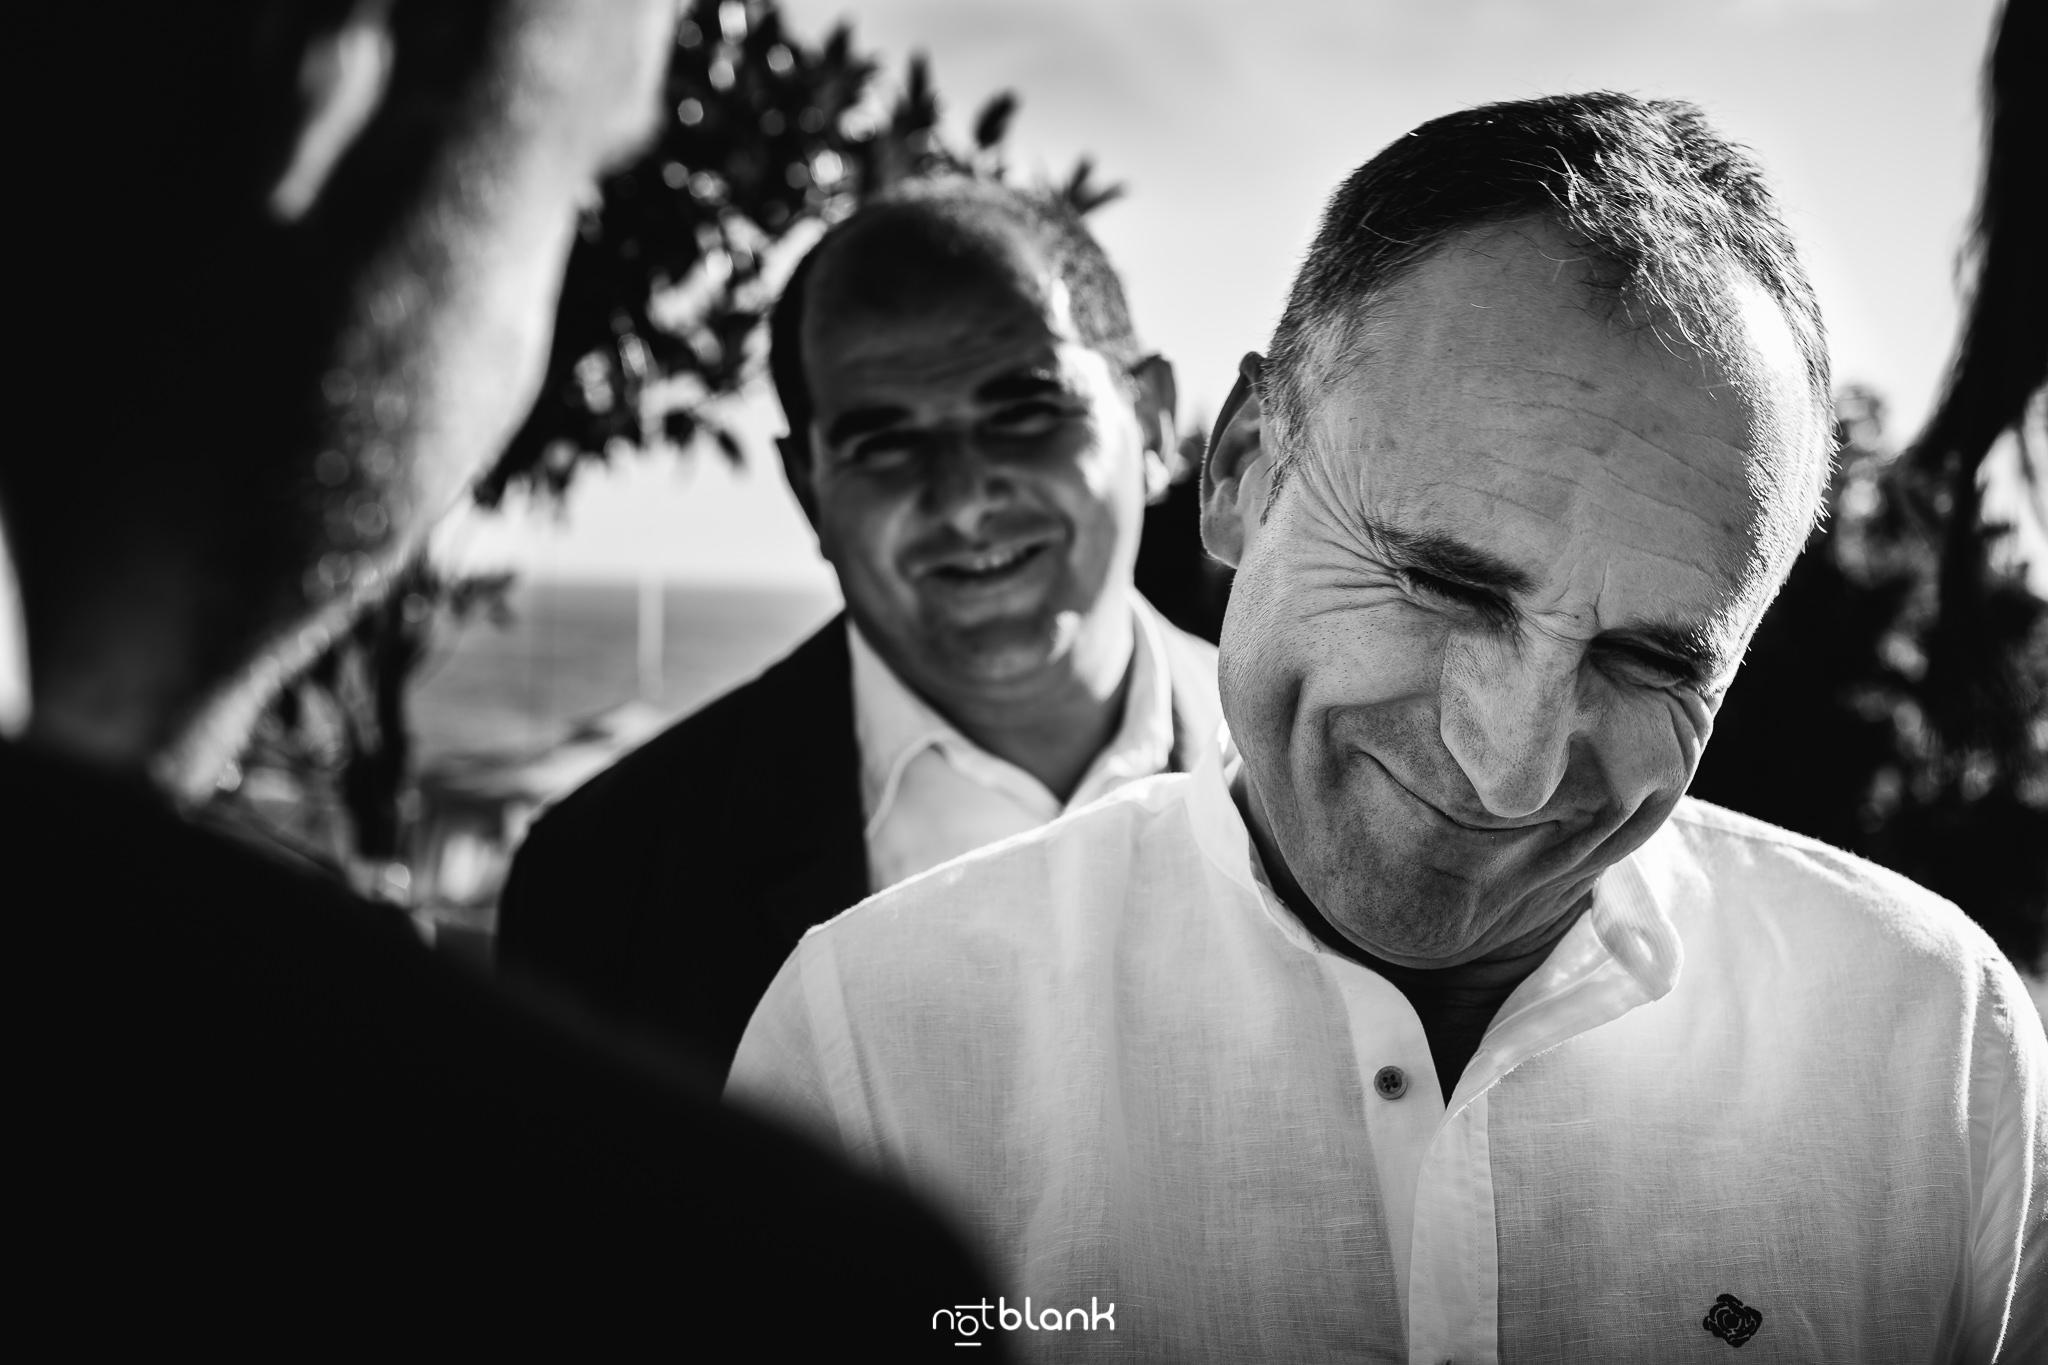 Boda-Maite-David-Amigos-Felicitan-Novia-Ceremonia-Civil-Talaso-Atlantico. Reportaje realizado por Notblank Fotografos de boda